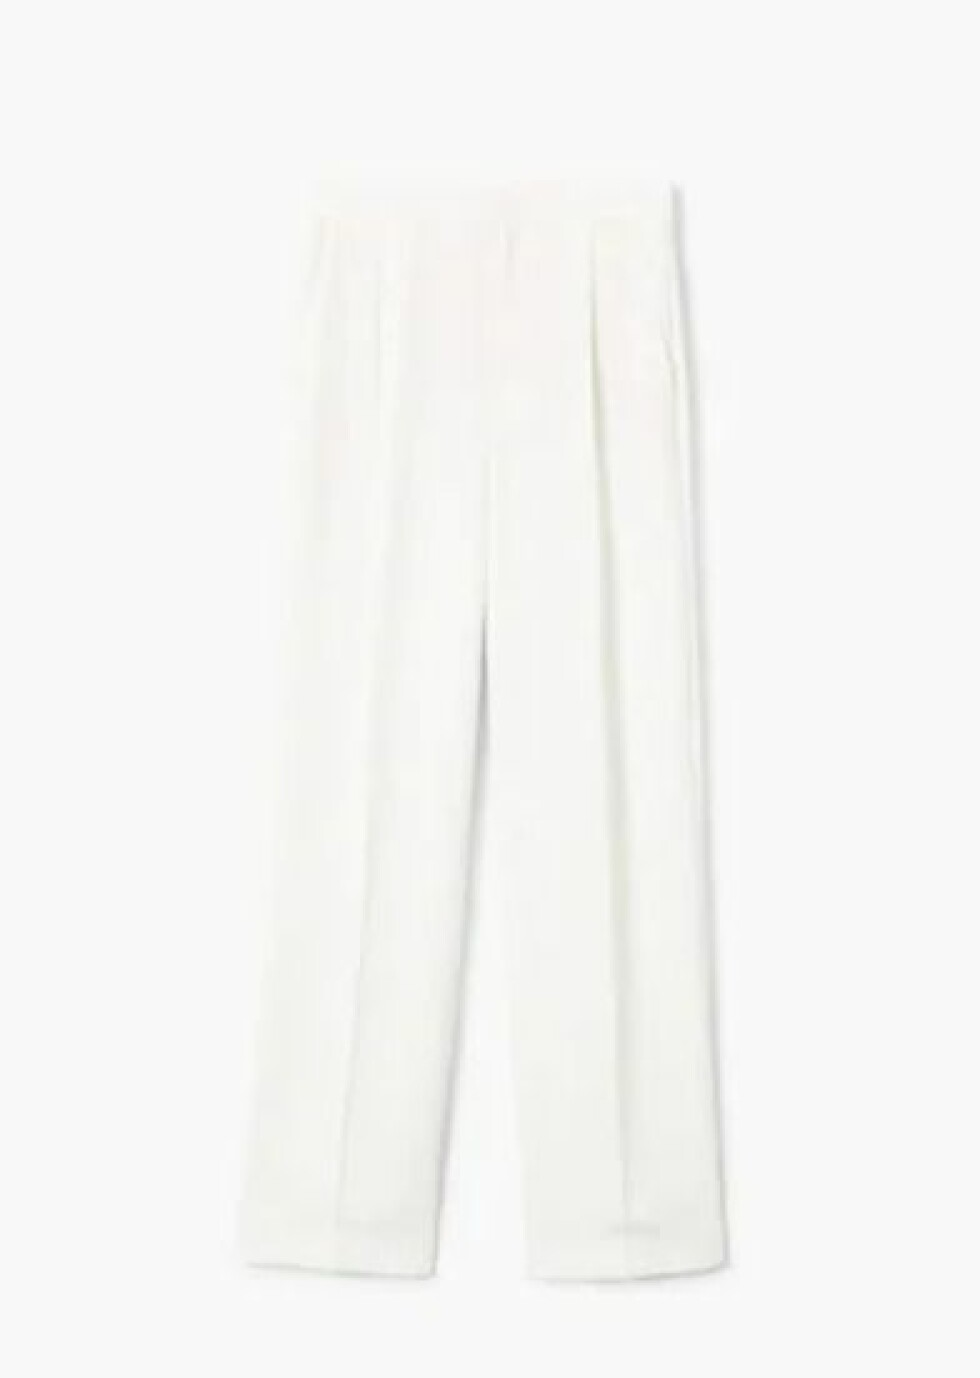 <strong>Bukse fra Mango  350,- https:</strong>//shop.mango.com/no-en/women/trousers-palazzo/pocket-palazzo-trousers_31051036.html?c=02&n=1&s=prendas_she.familia;26,326,22,322